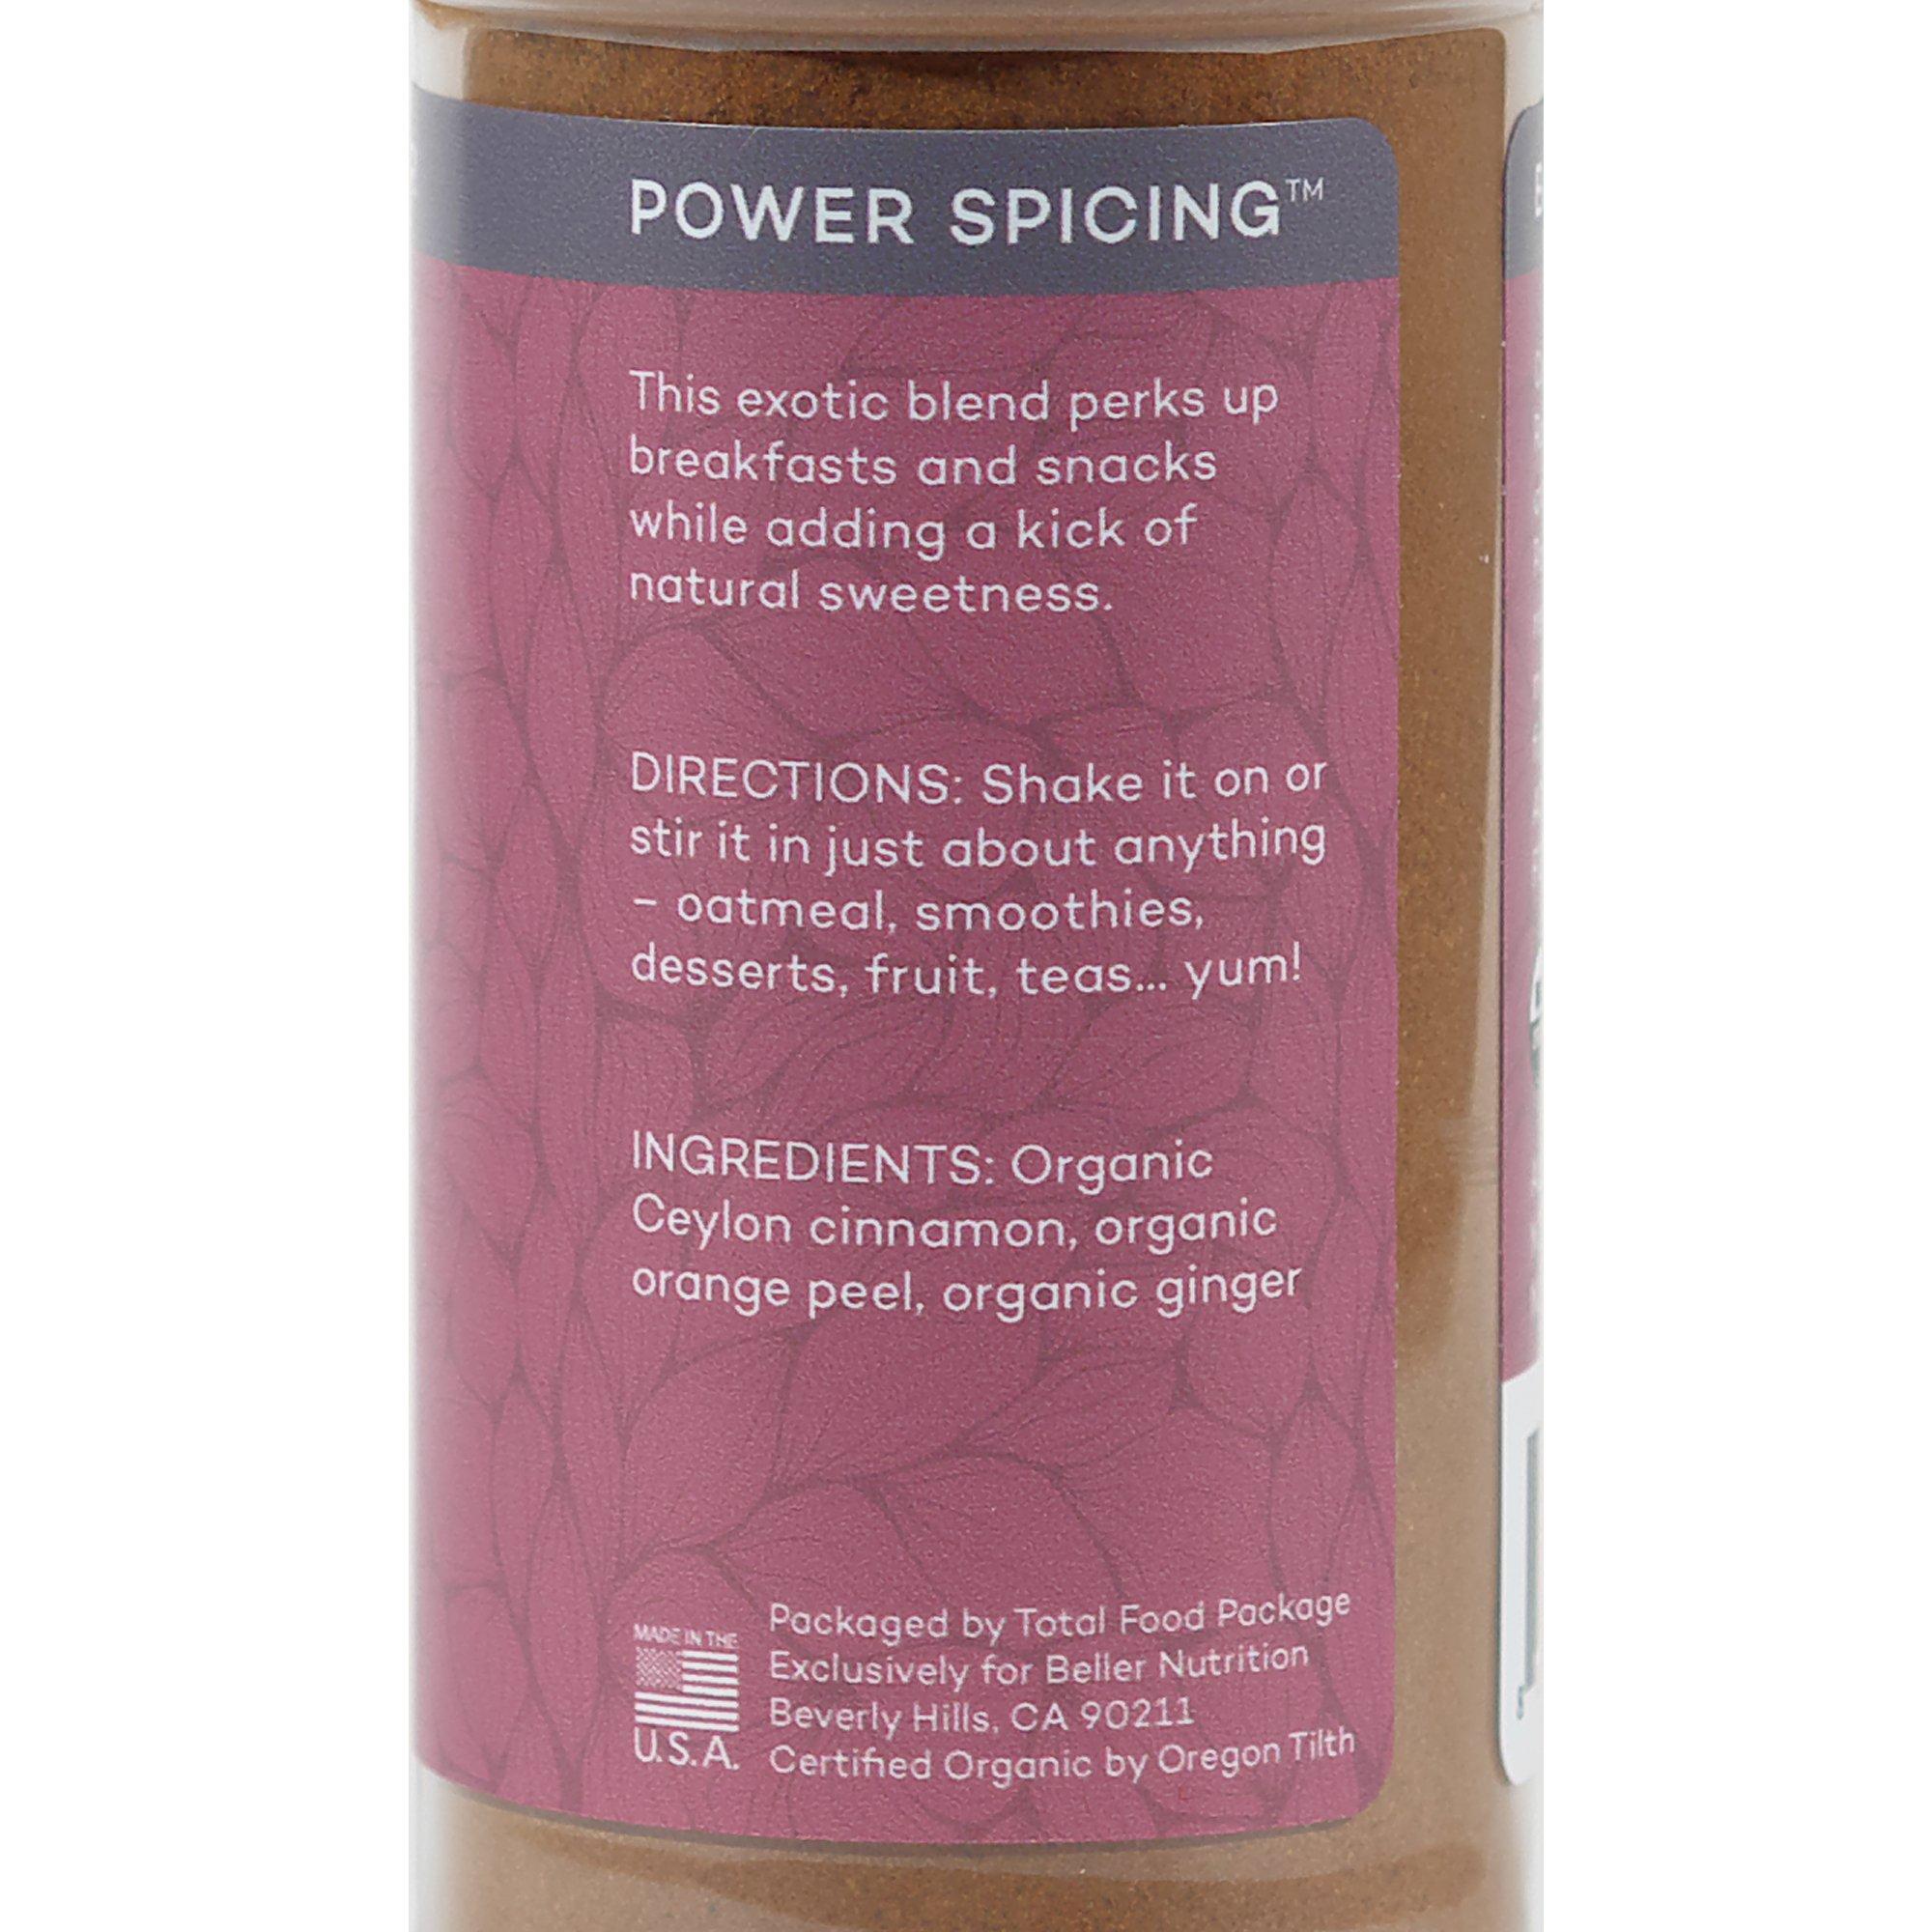 Rachel Beller's Power Pantry CinnaPeel Spicer - All organic Ceylon cinnamon, orange peel, and ginger spice blend, 3.4 ounce by Rachel Beller's Power Pantry (Image #5)